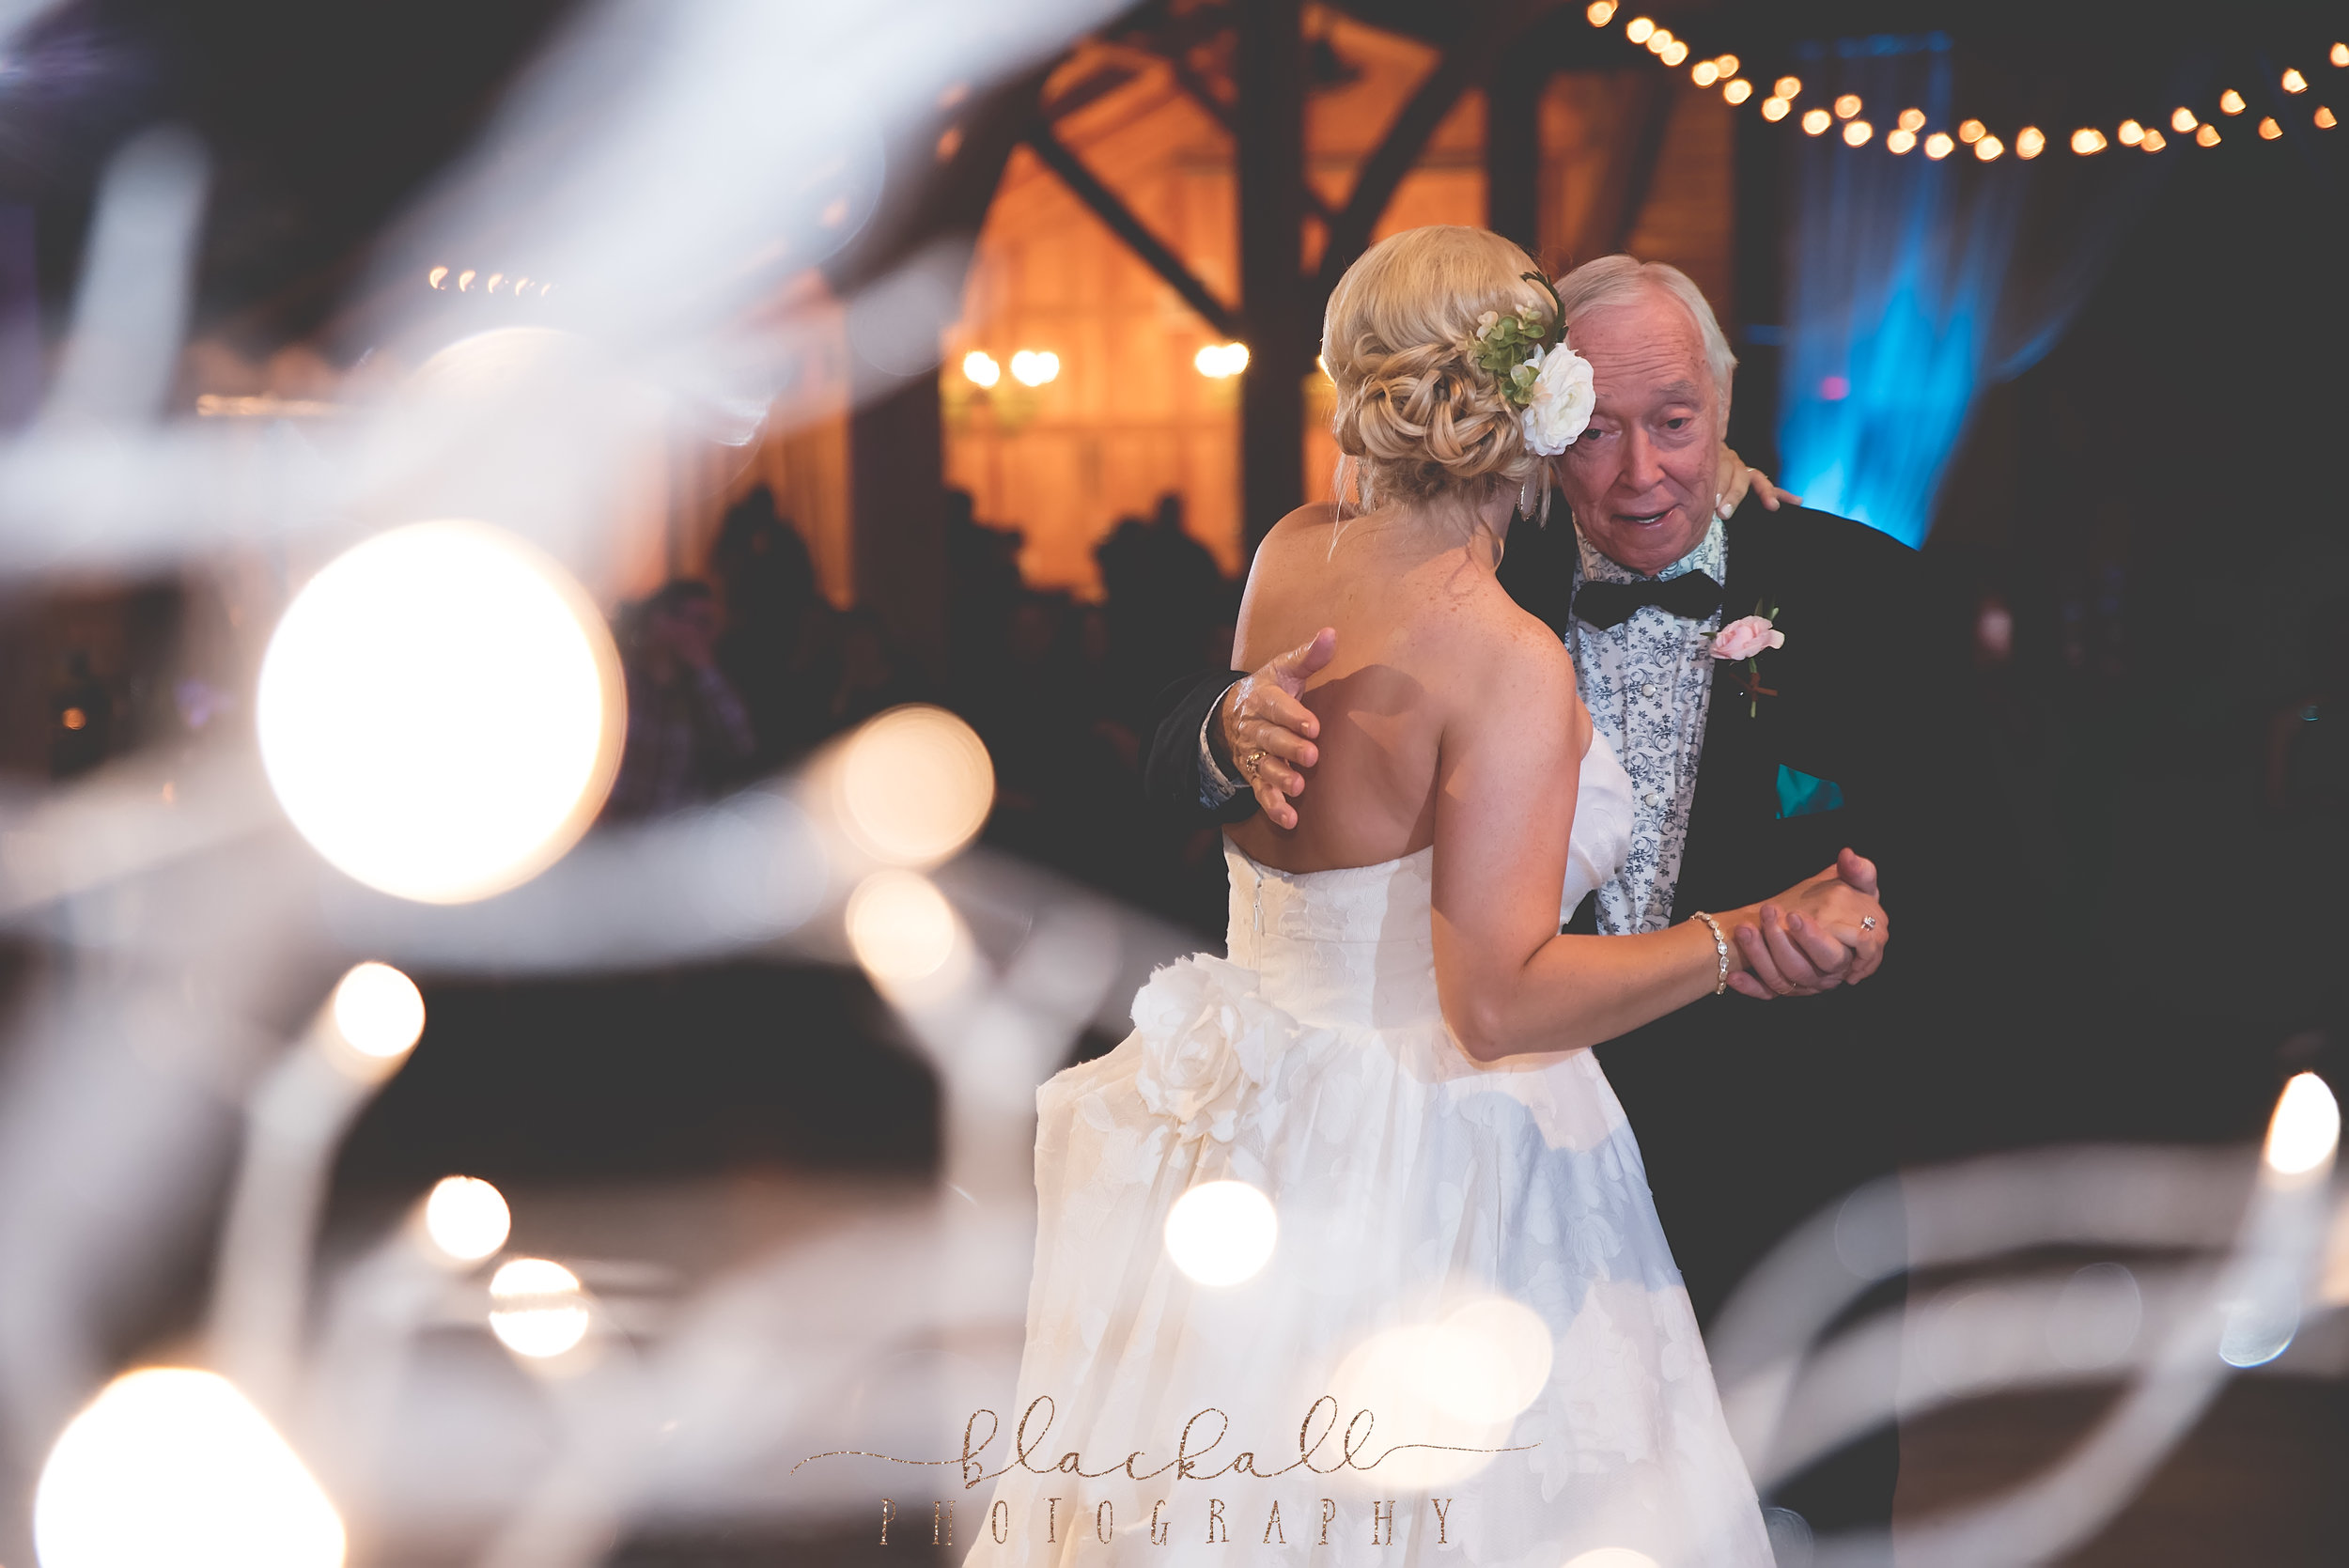 M&M WEDDING_Blackall Photography-90.JPG